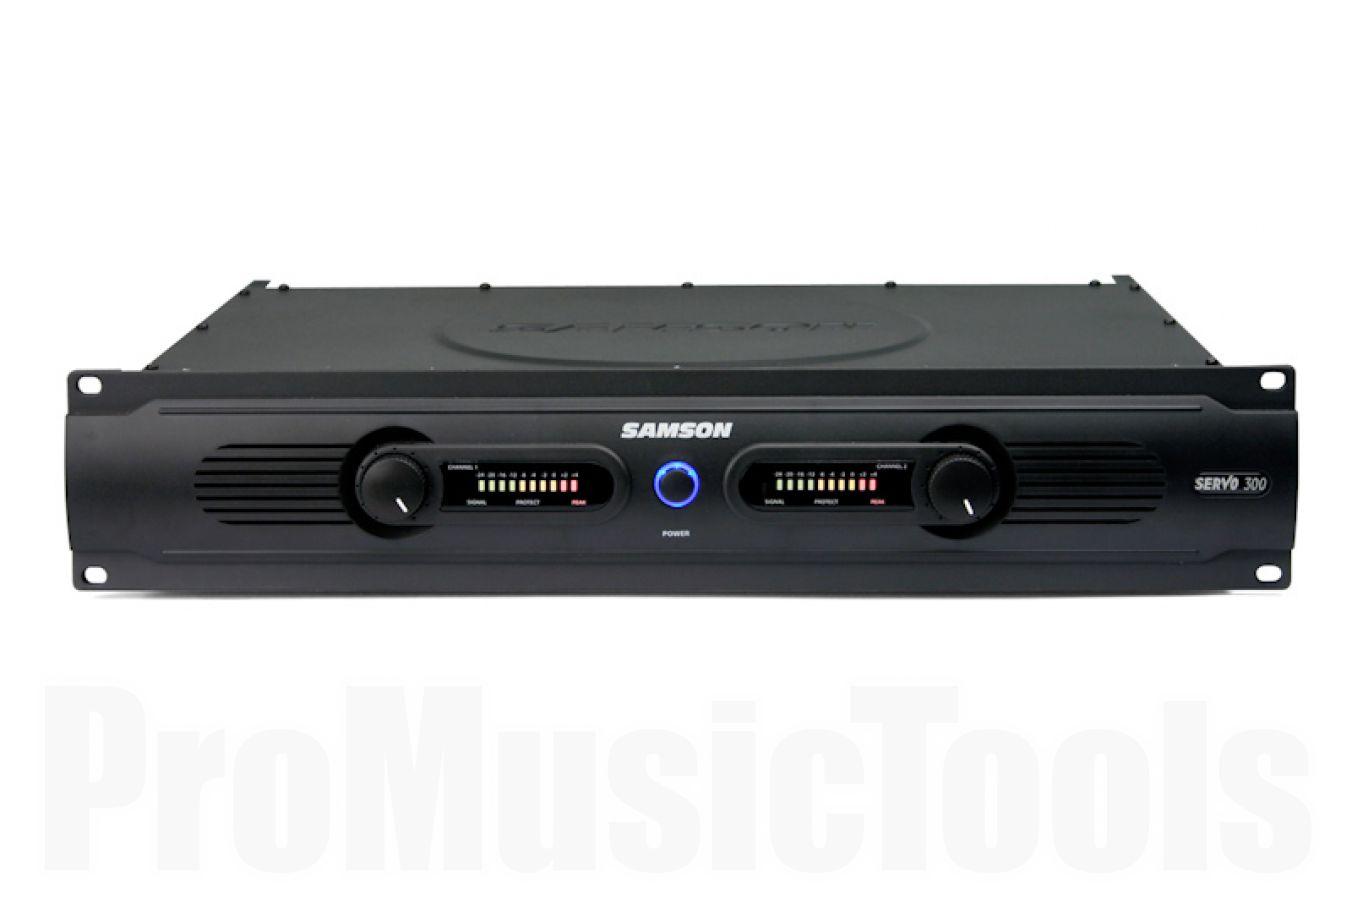 Samson Servo 300 Power Amplifier